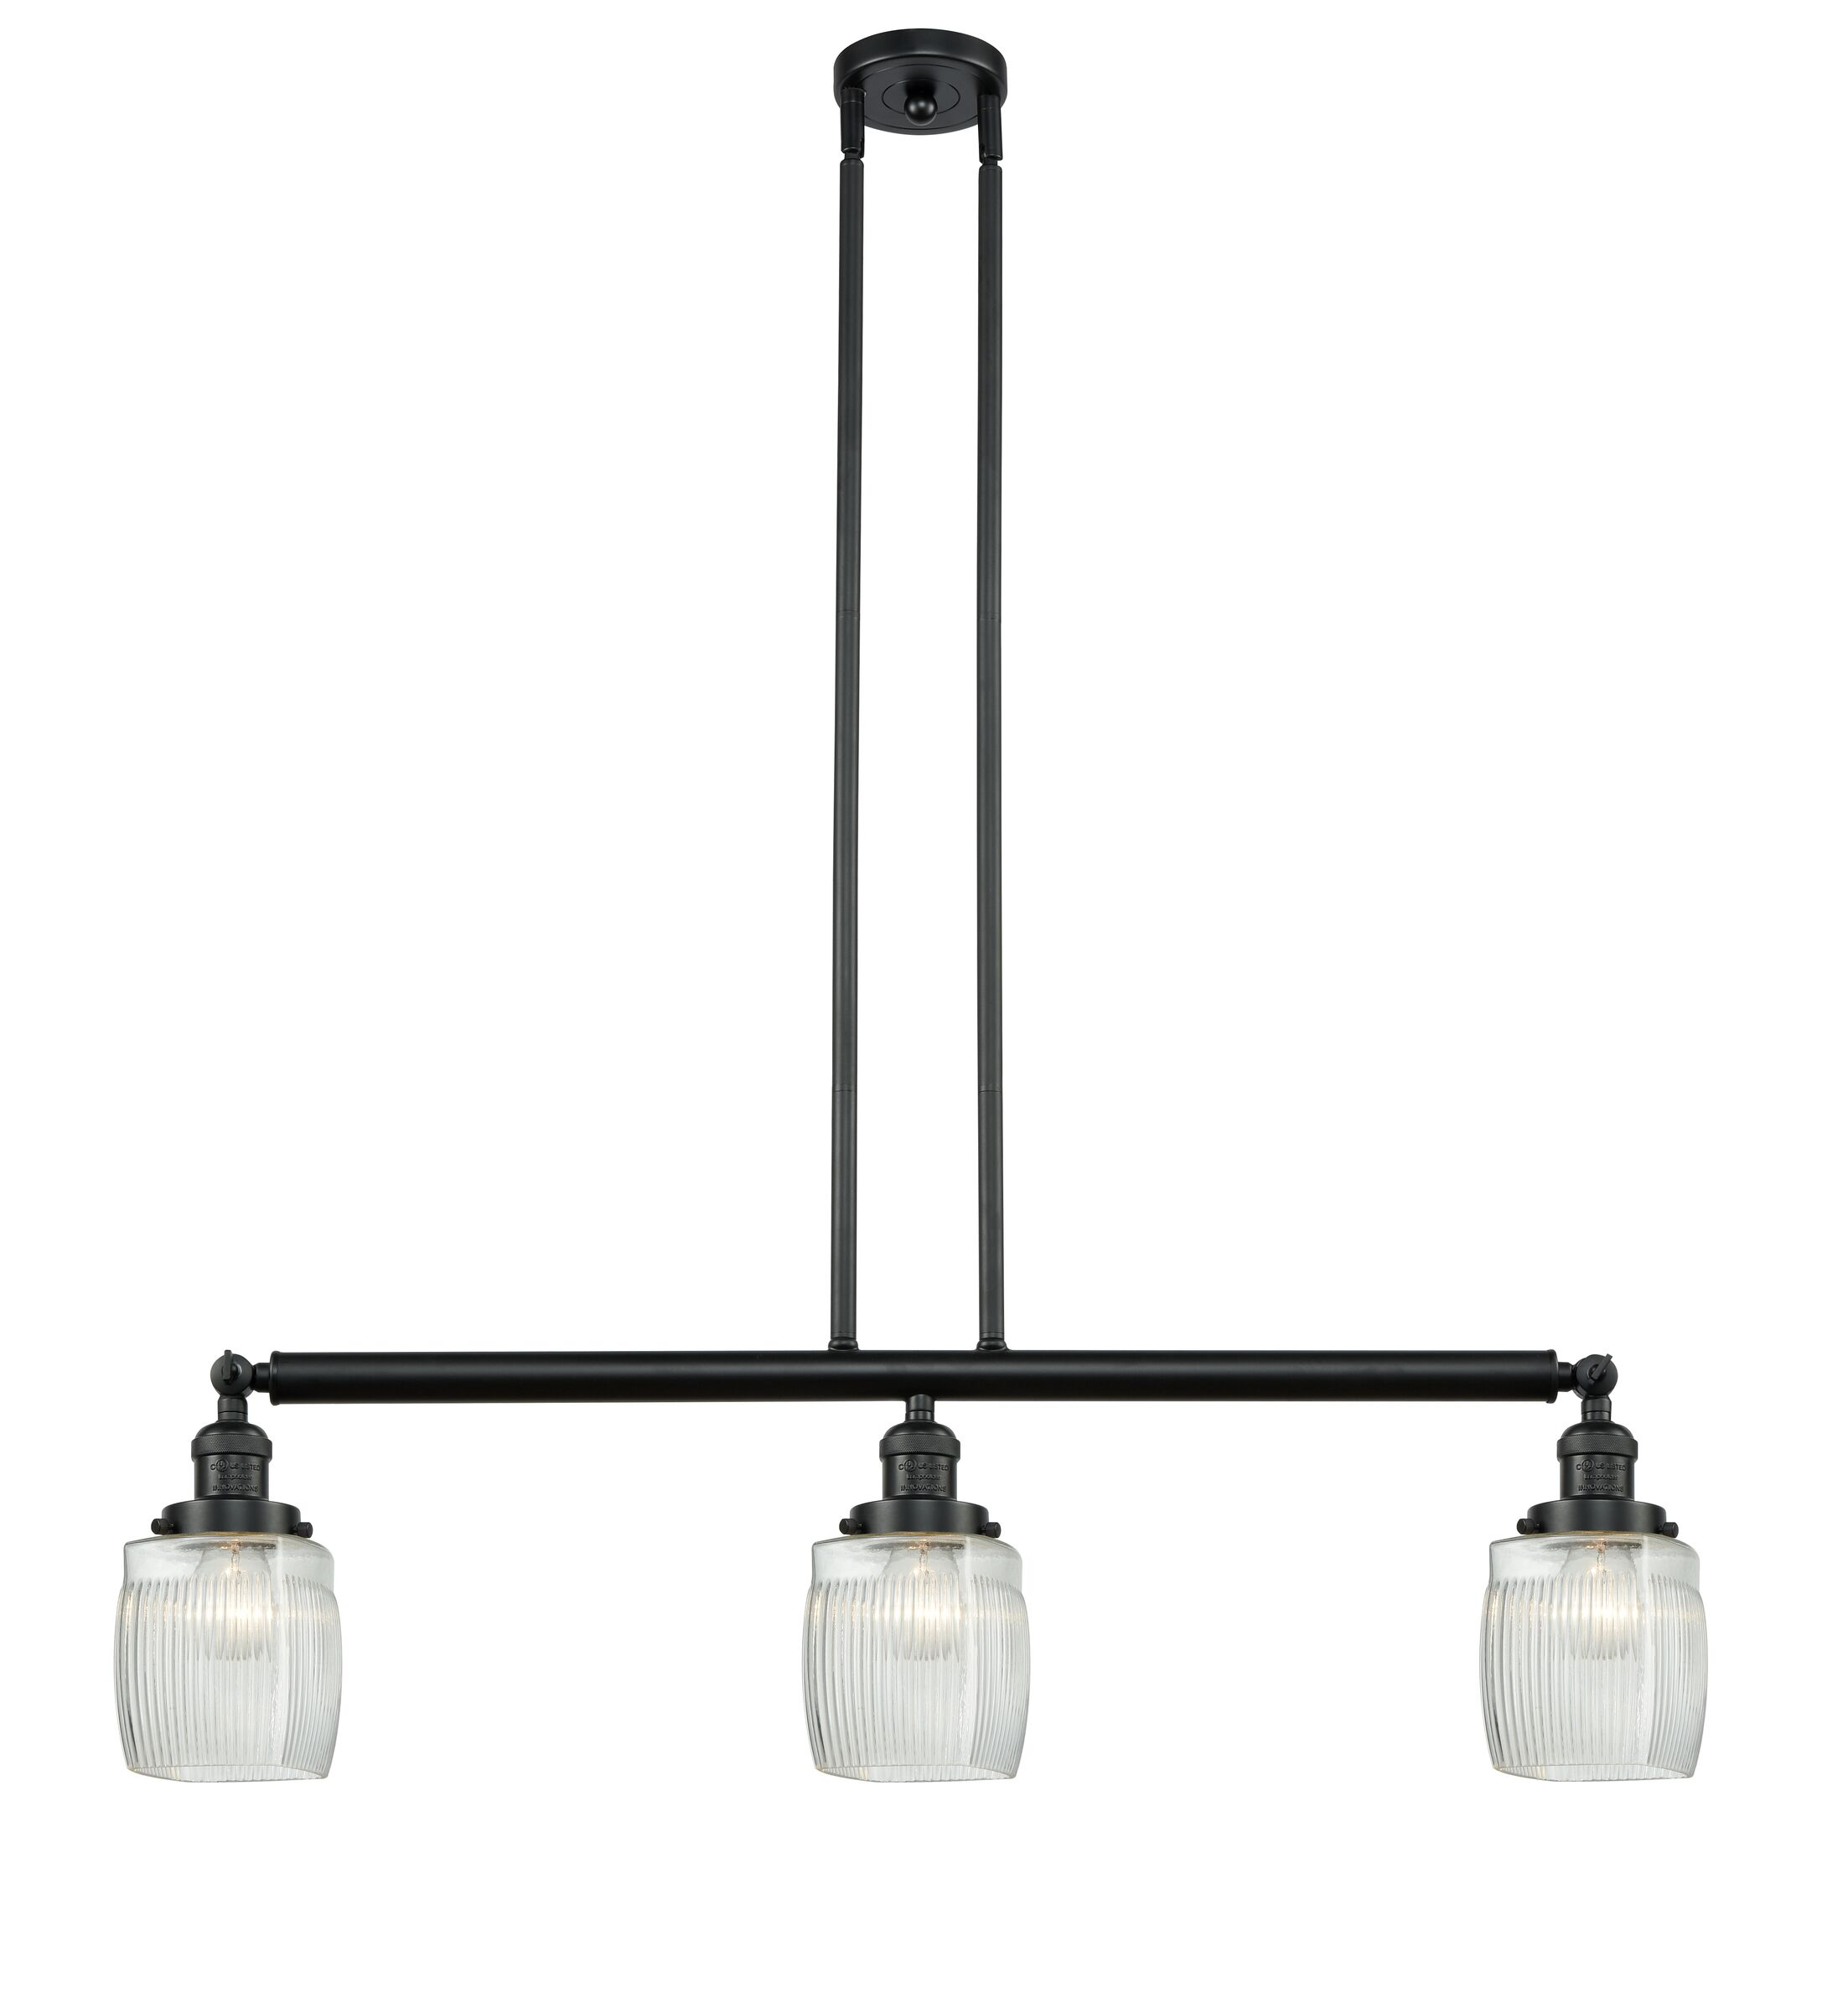 Mireya 3-Light Kitchen Island Pendant Bulb Type: Incandescent, Finish: Matte Black